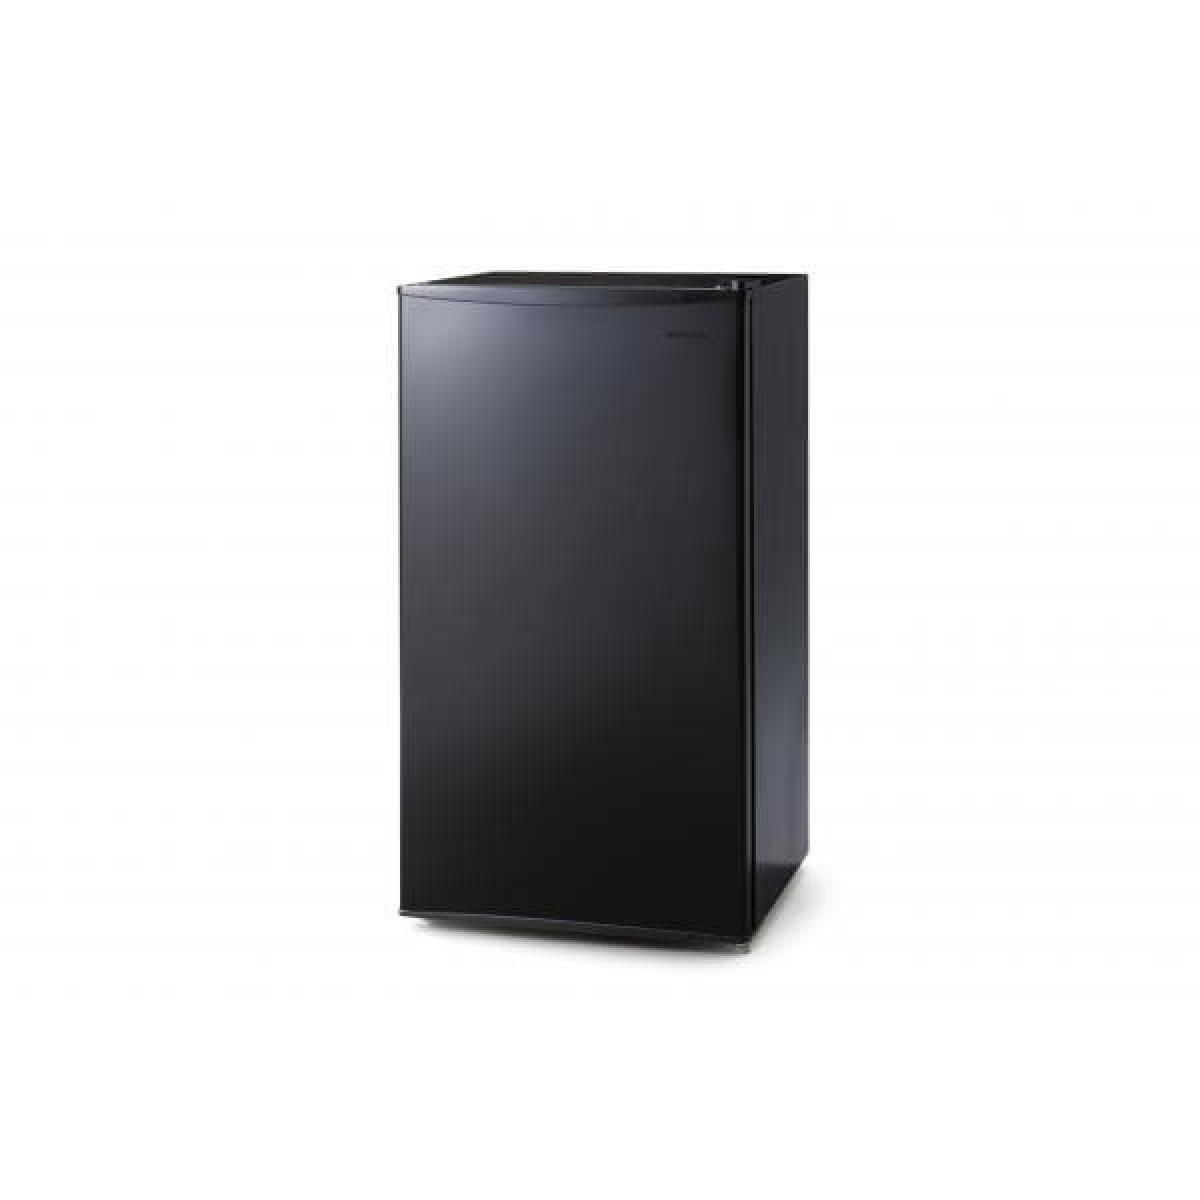 【I】【代引不可】アイリスオーヤマ 冷蔵庫 93L 2ドア 右開き 静音 ノンフロン ブラック IRJD-9A-B【離島・沖縄・北海道不可】